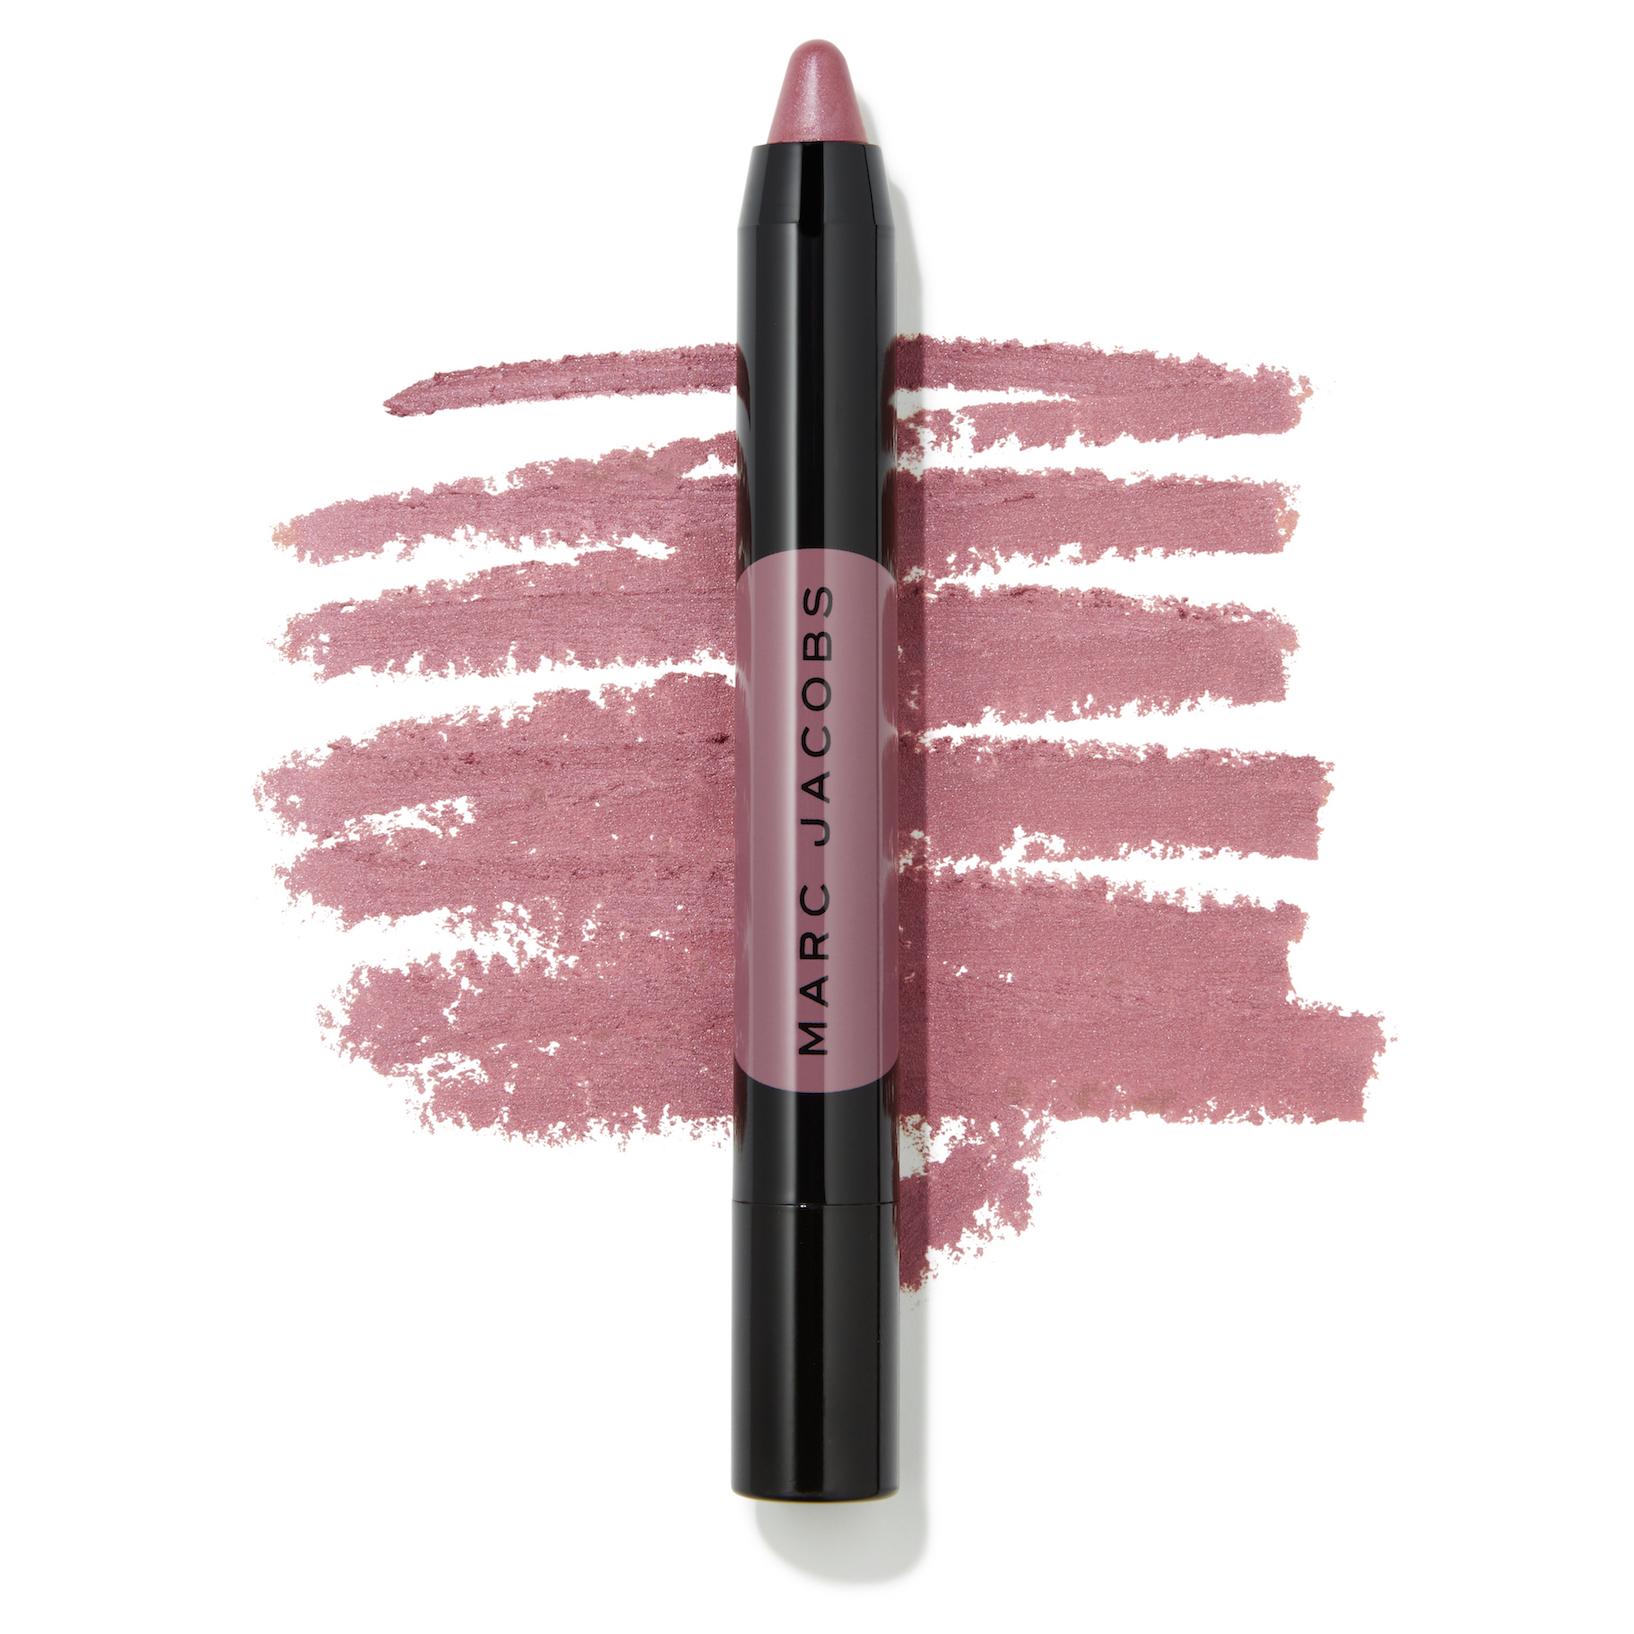 Marc Jacobs Beauty Le Marc Liquid Lip Crayon - Night Mauve Swatch - AED 125